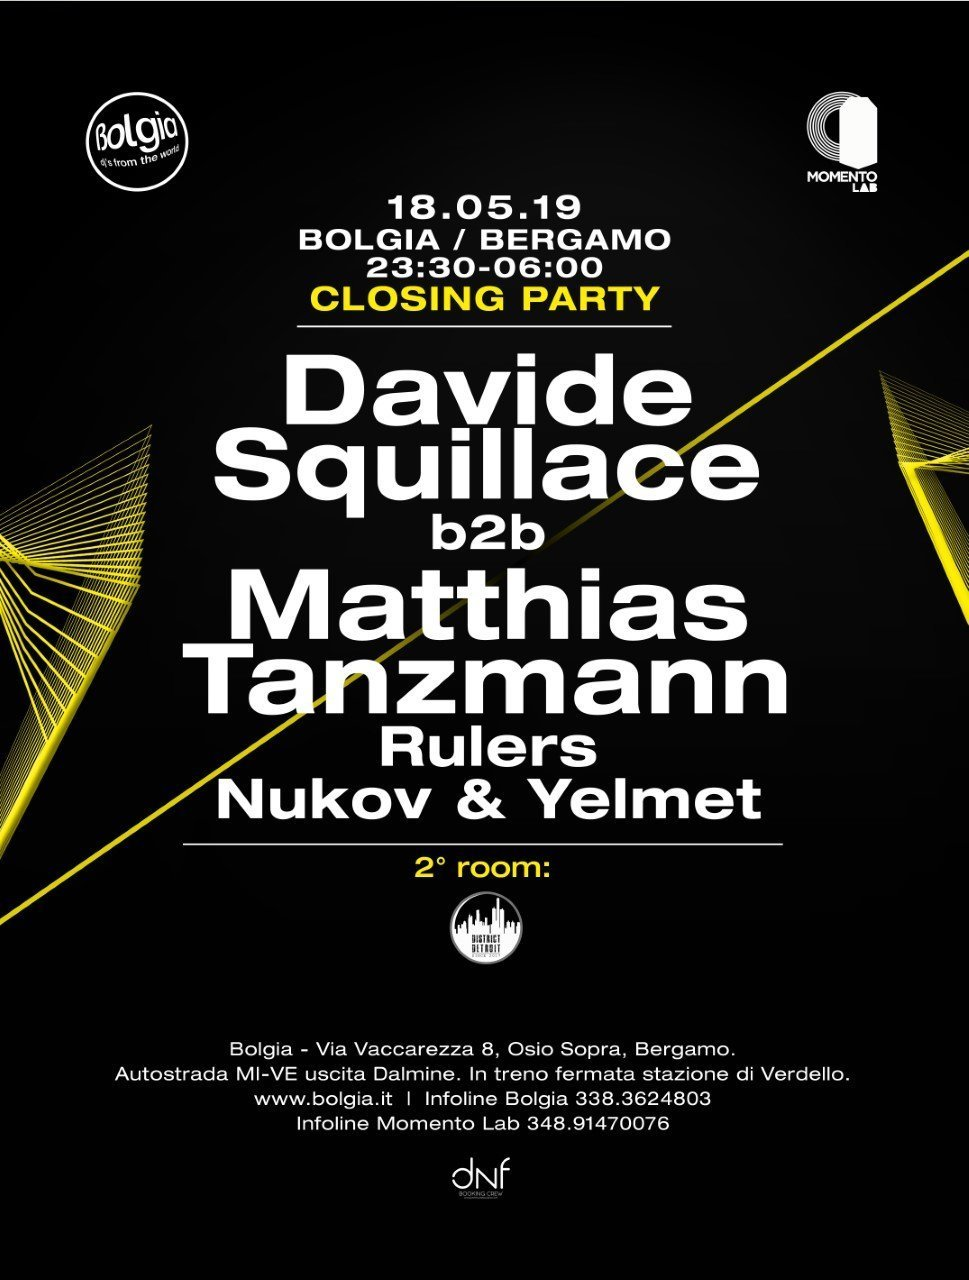 Davide Squillace b2b Matthias Tanzmann @ Bolgia BG